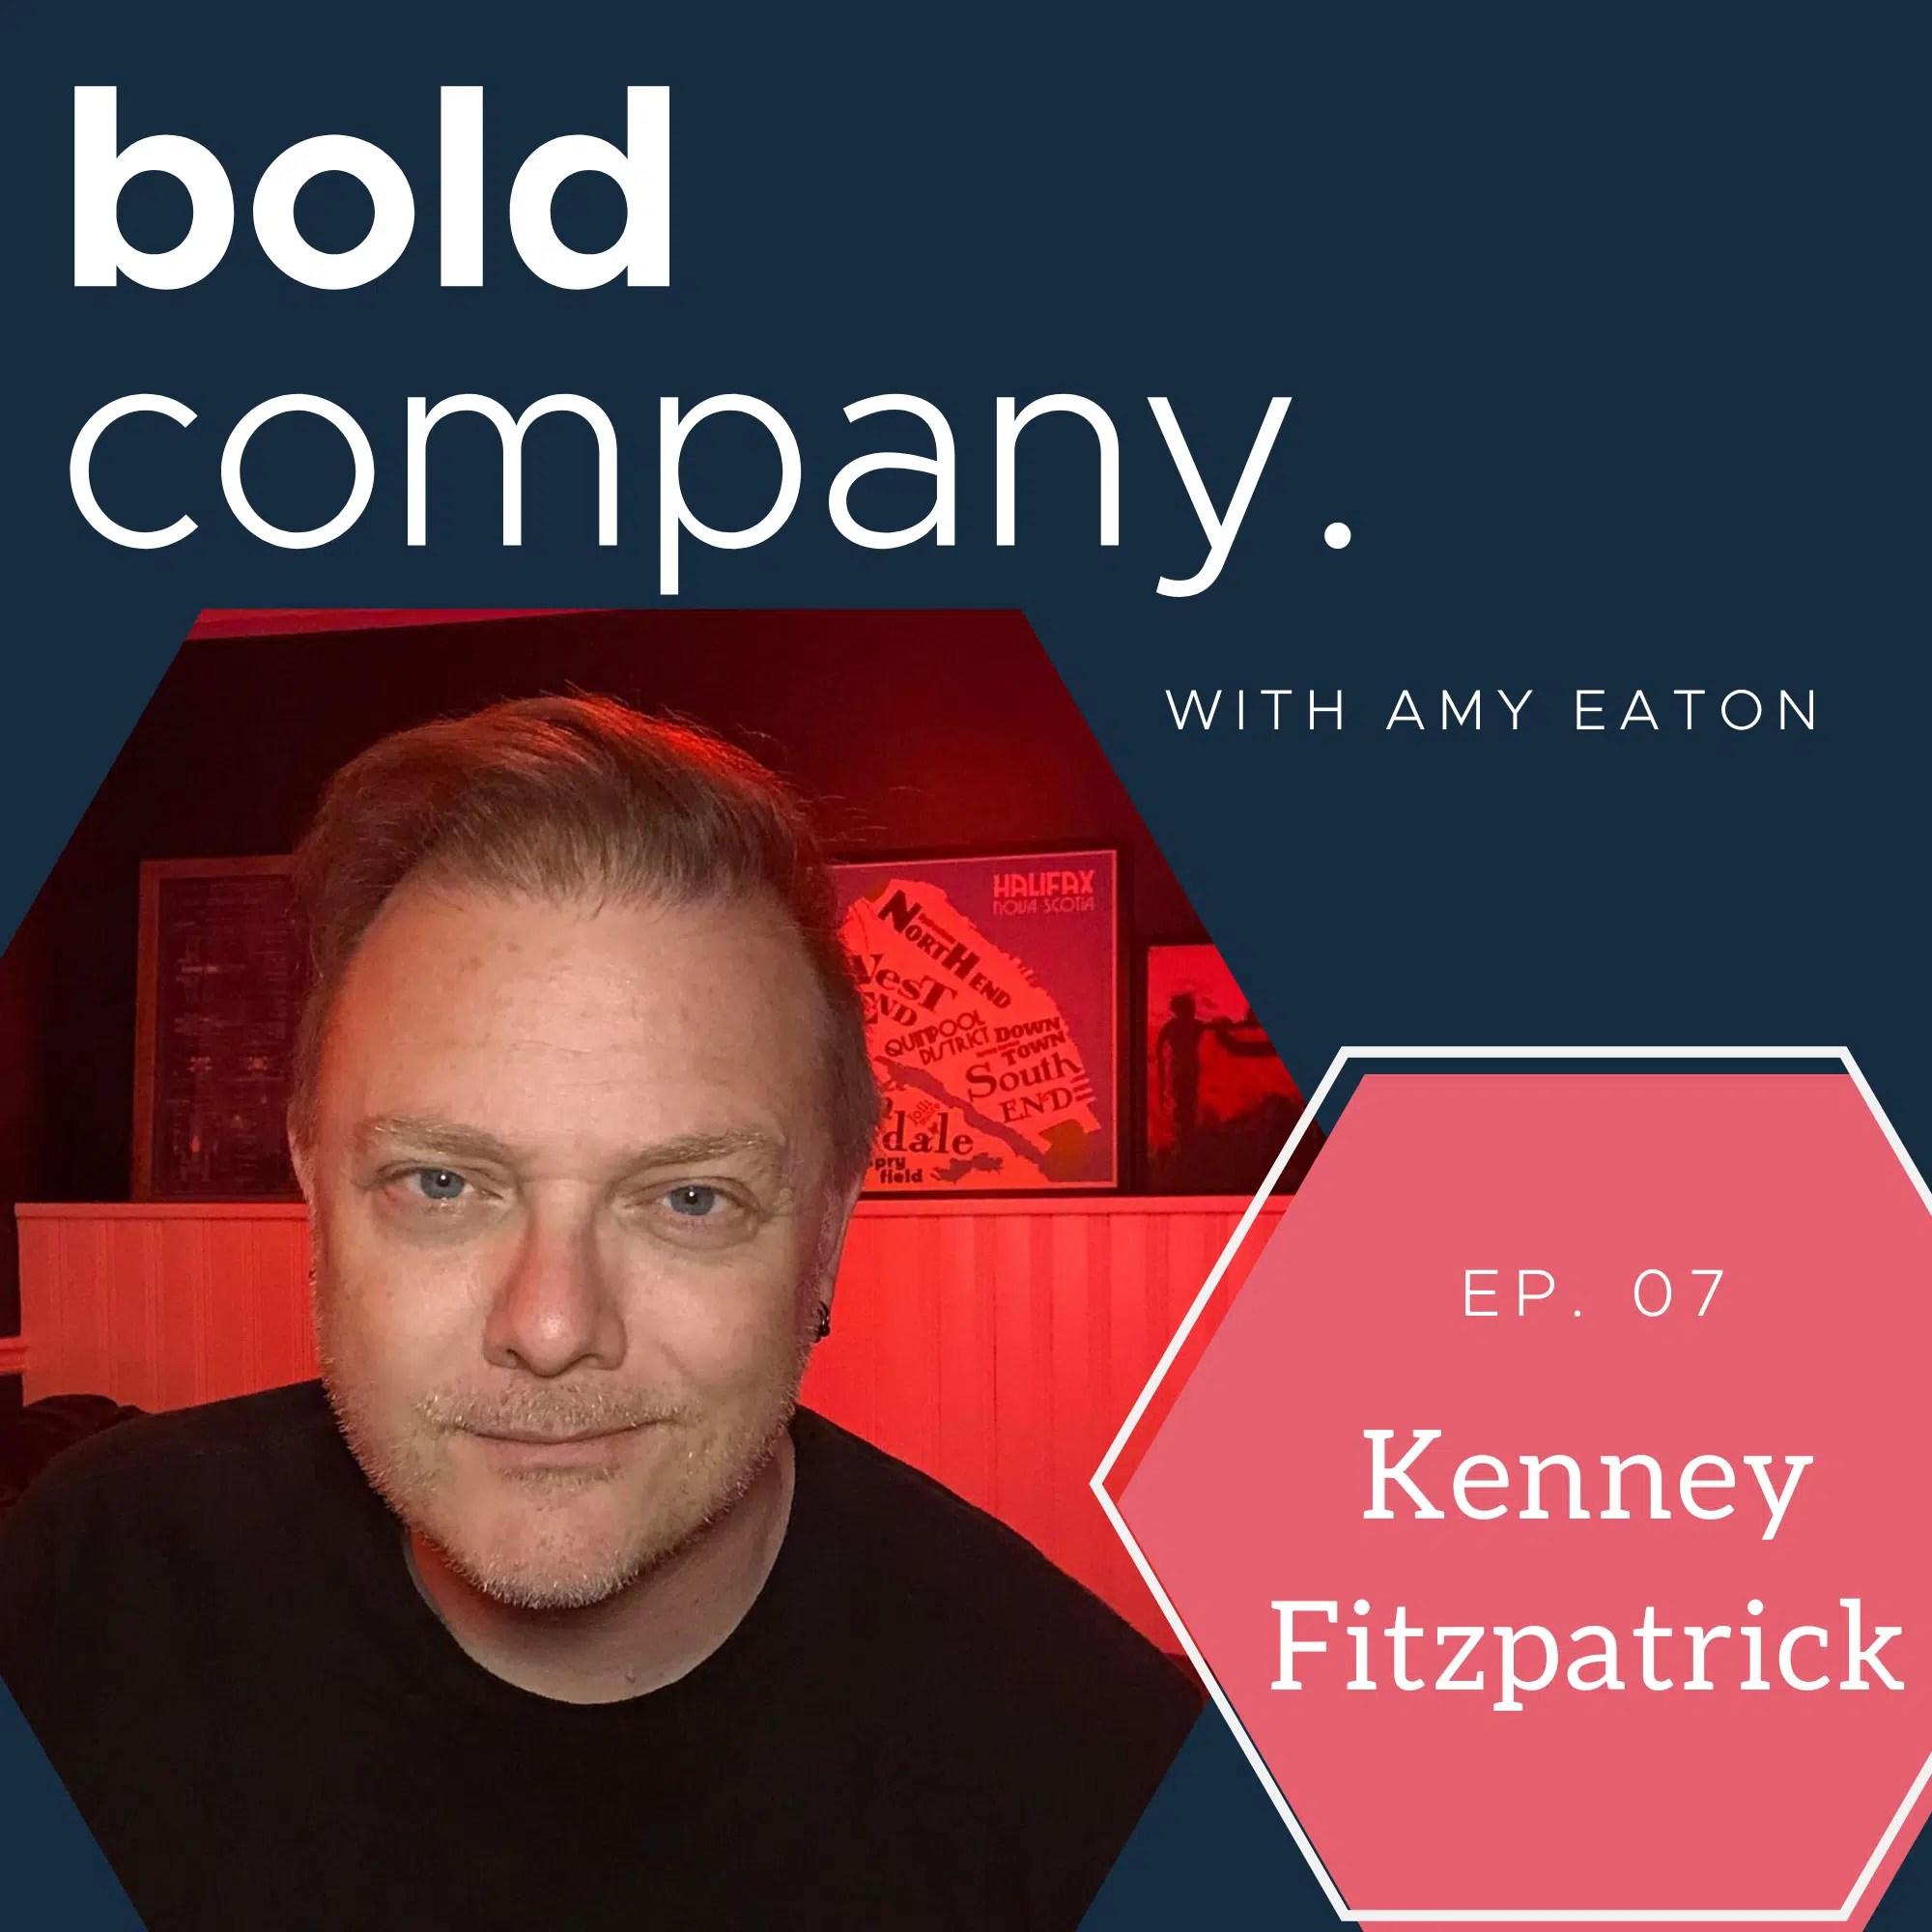 Bold Company Episode 7 – Kenney Fitzpatrick